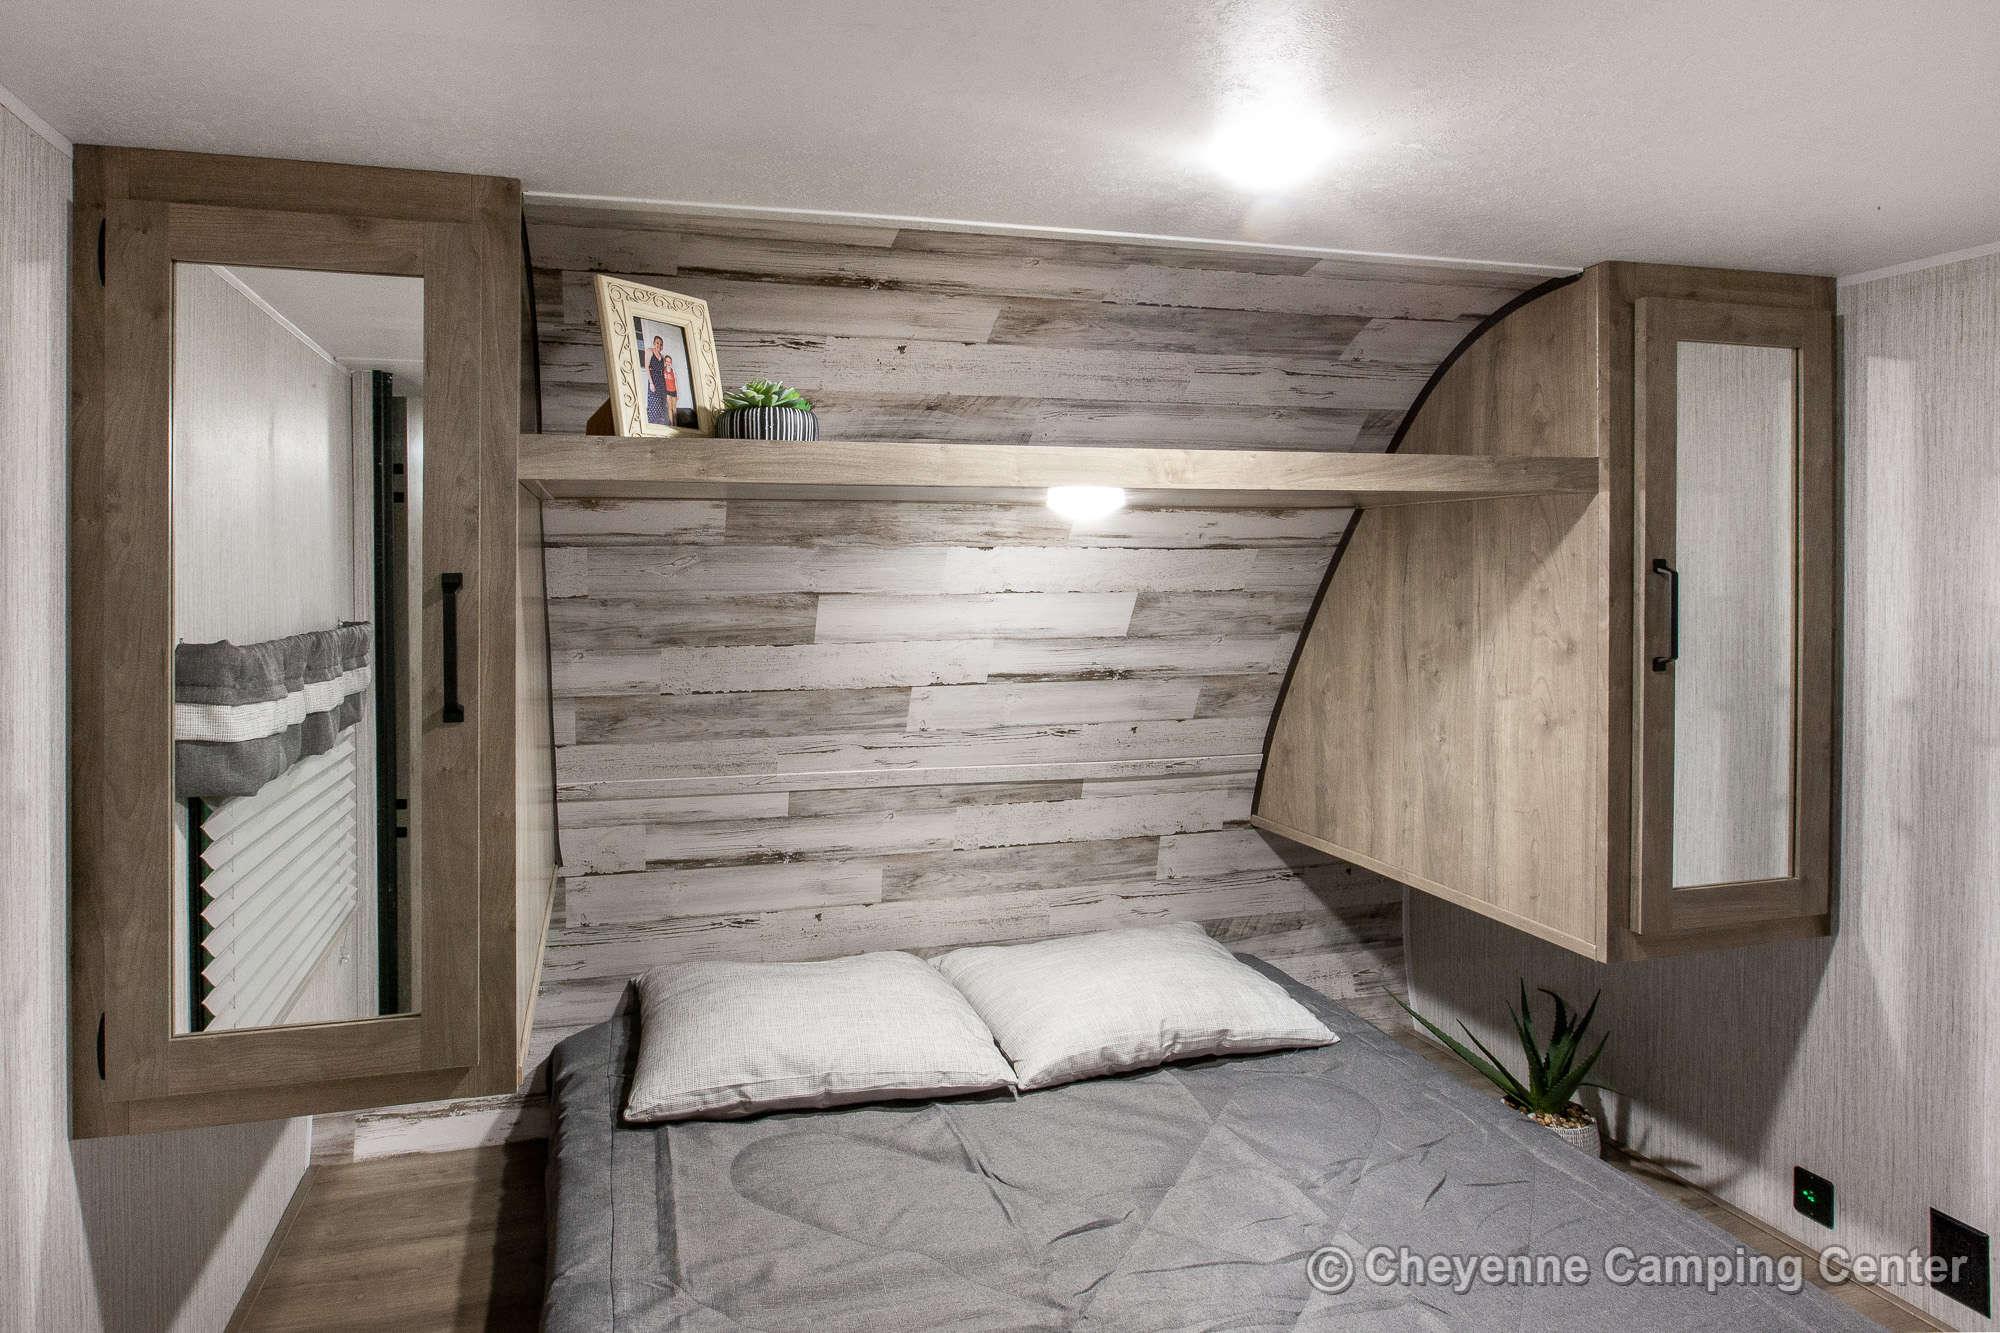 2021 Palomino Puma XLE Lite 30DBSC Bunkhouse Travel Trailer Interior Image